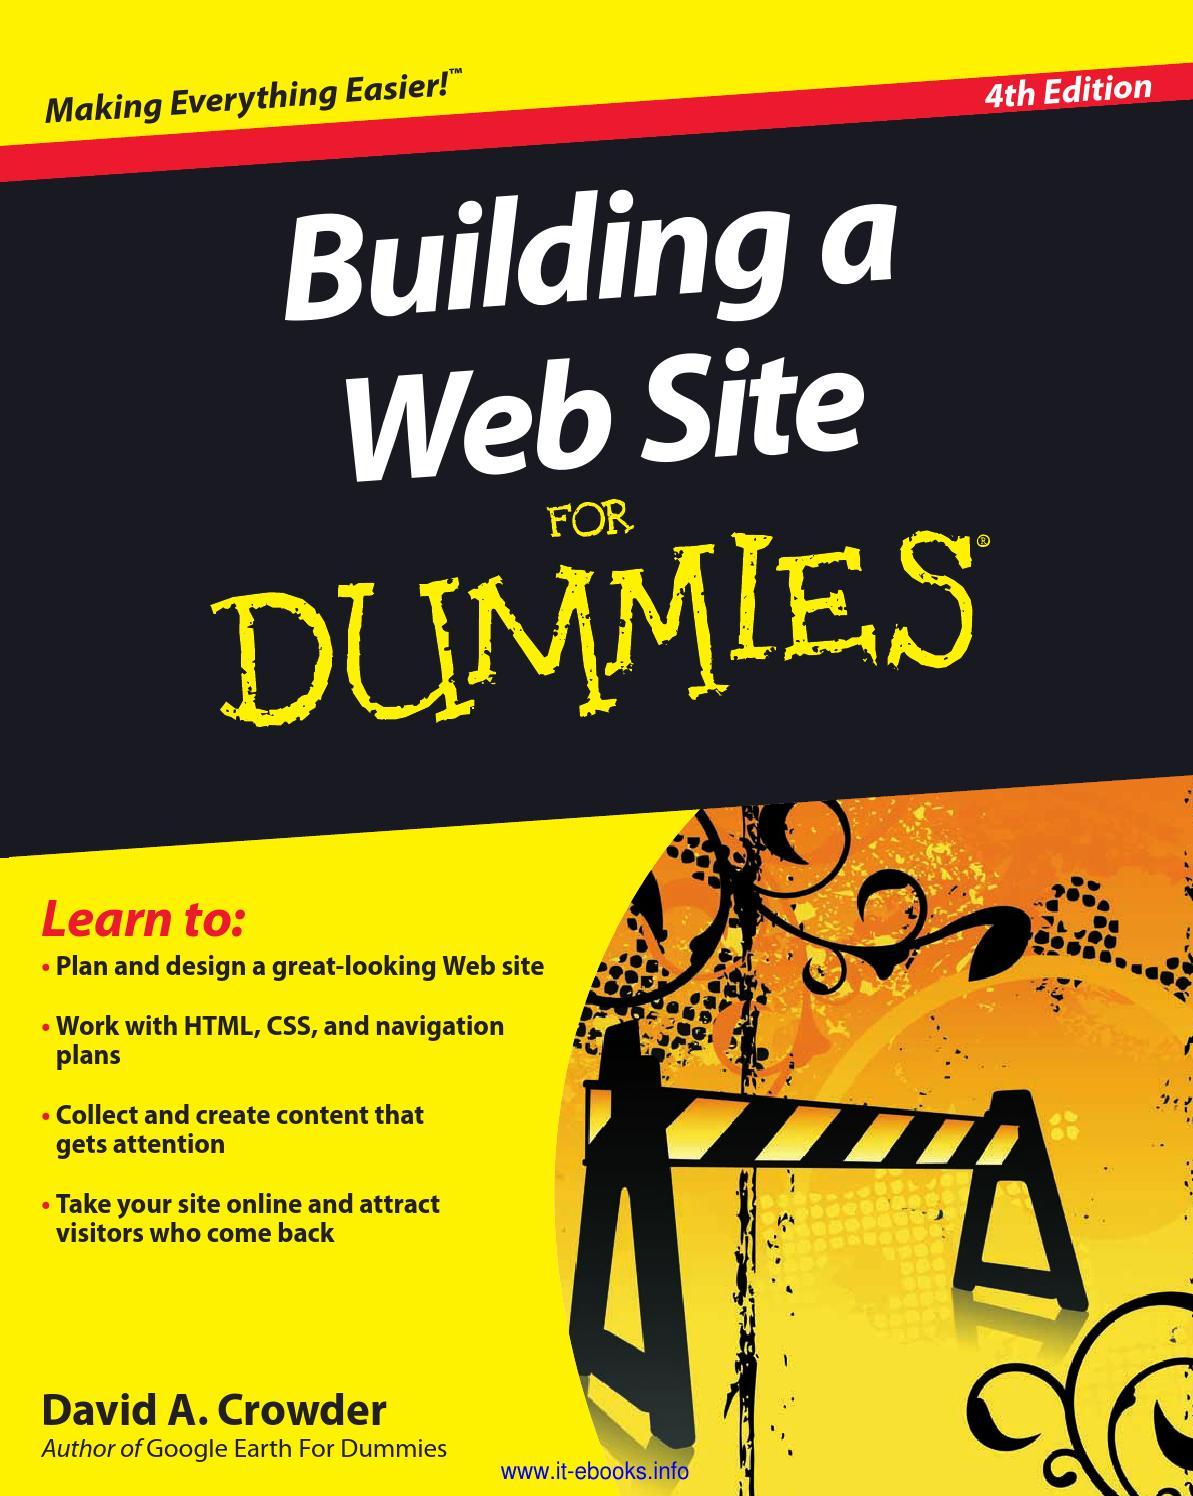 Building a website for dummies by black_kracker193 - issuu